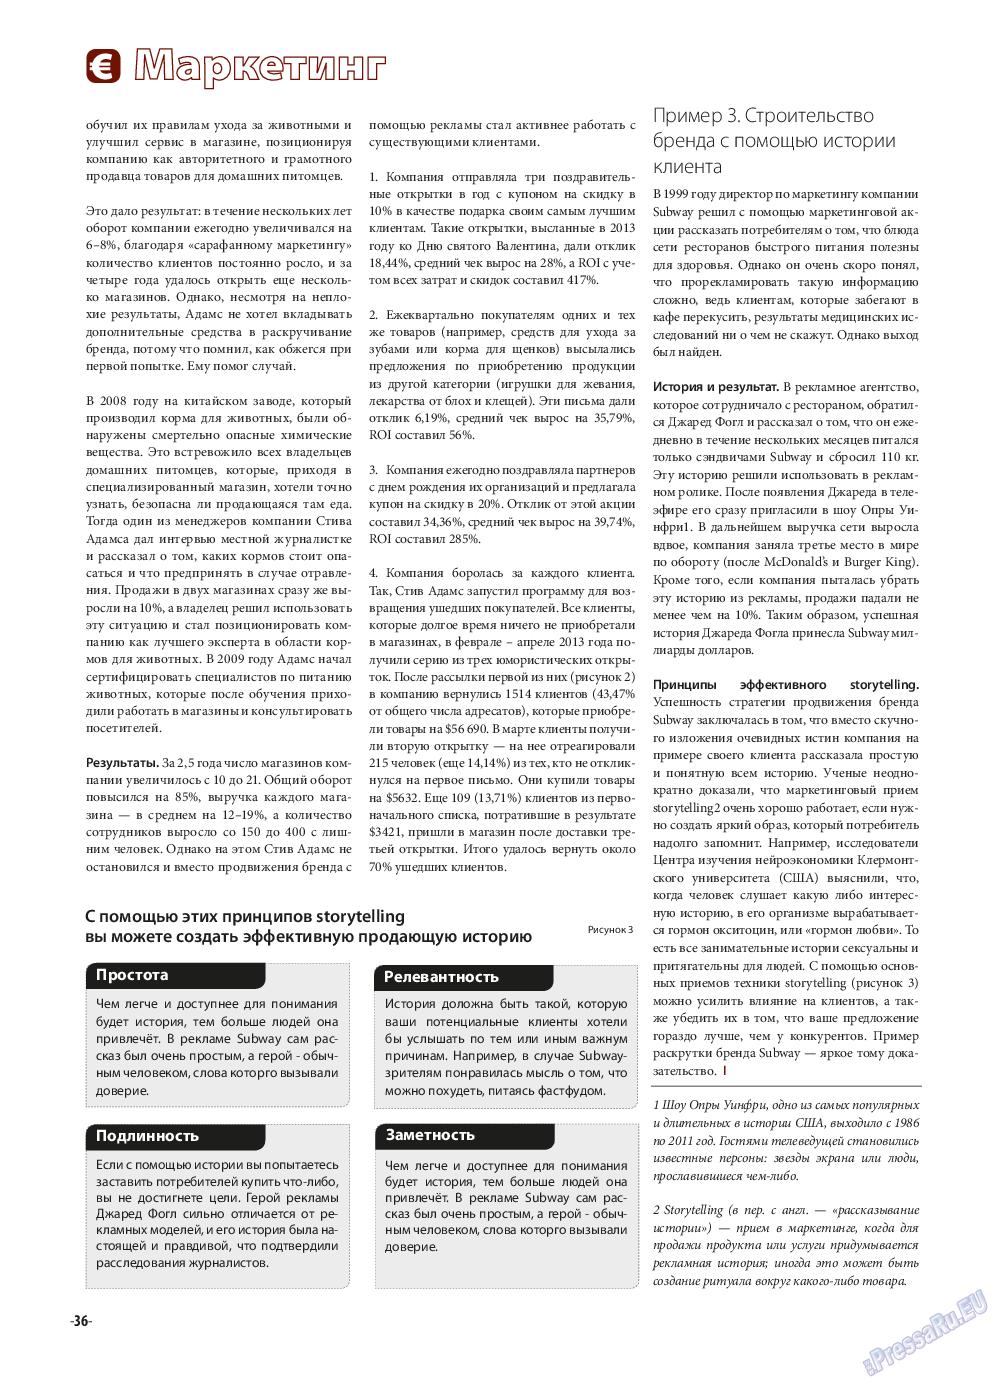 iDEAL (журнал). 2015 год, номер 11, стр. 36